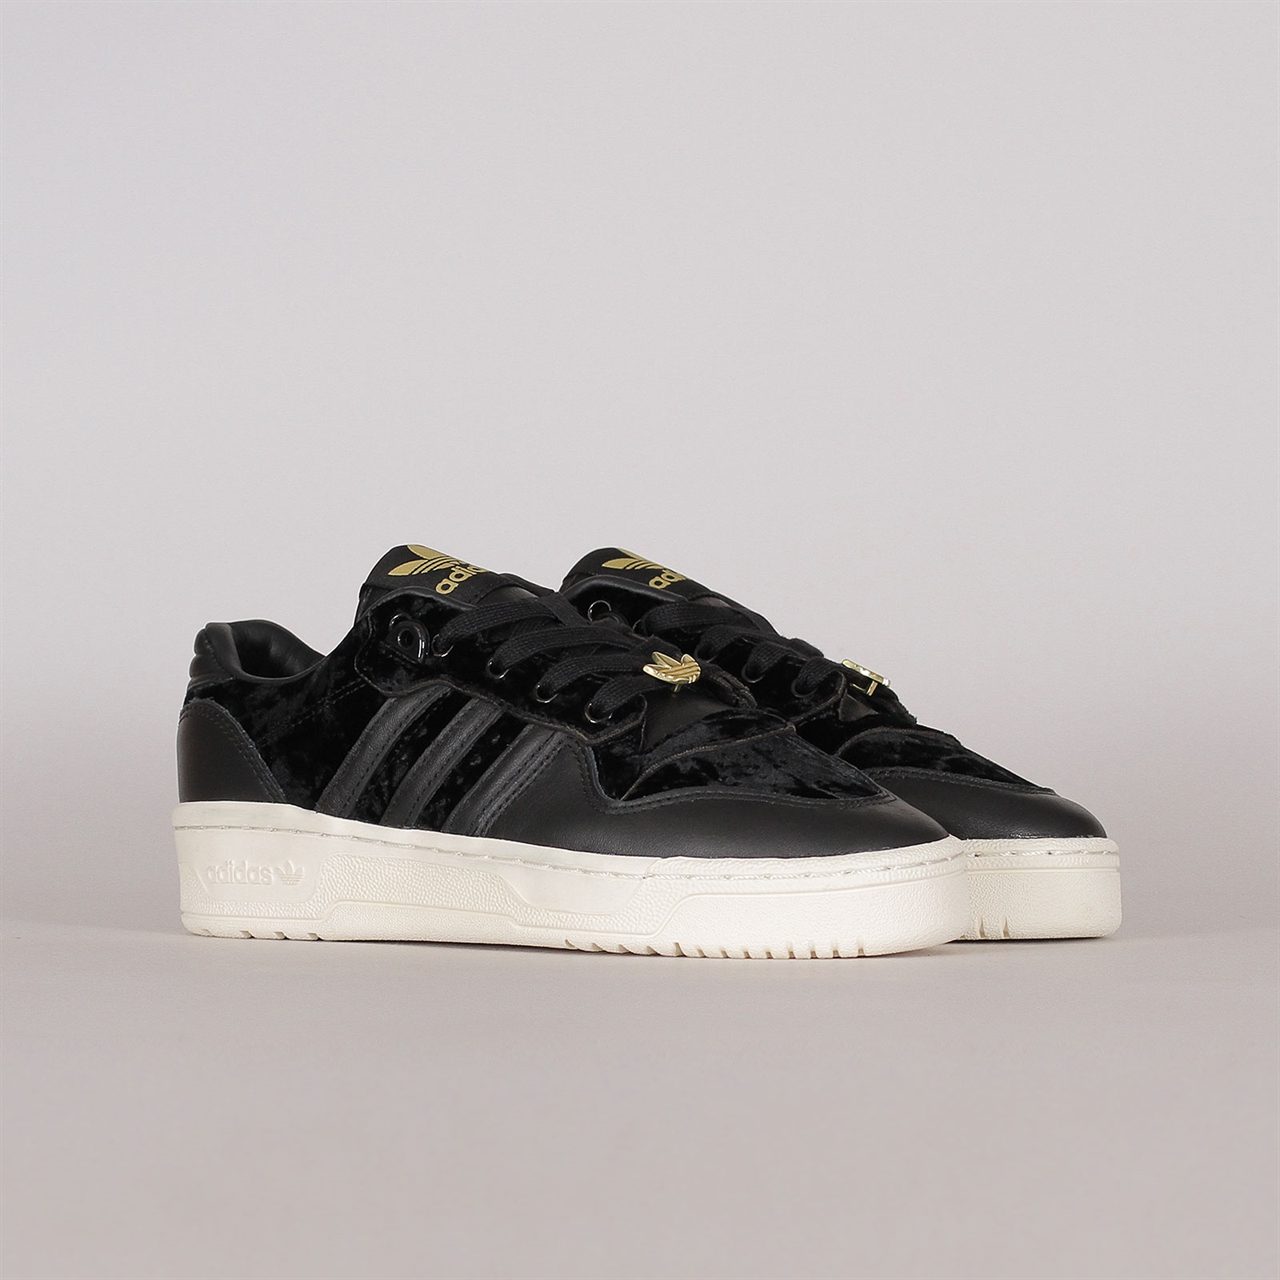 Shelta Adidas Originals Rivalry Low Velvet Gemstone Pack (EH0181)